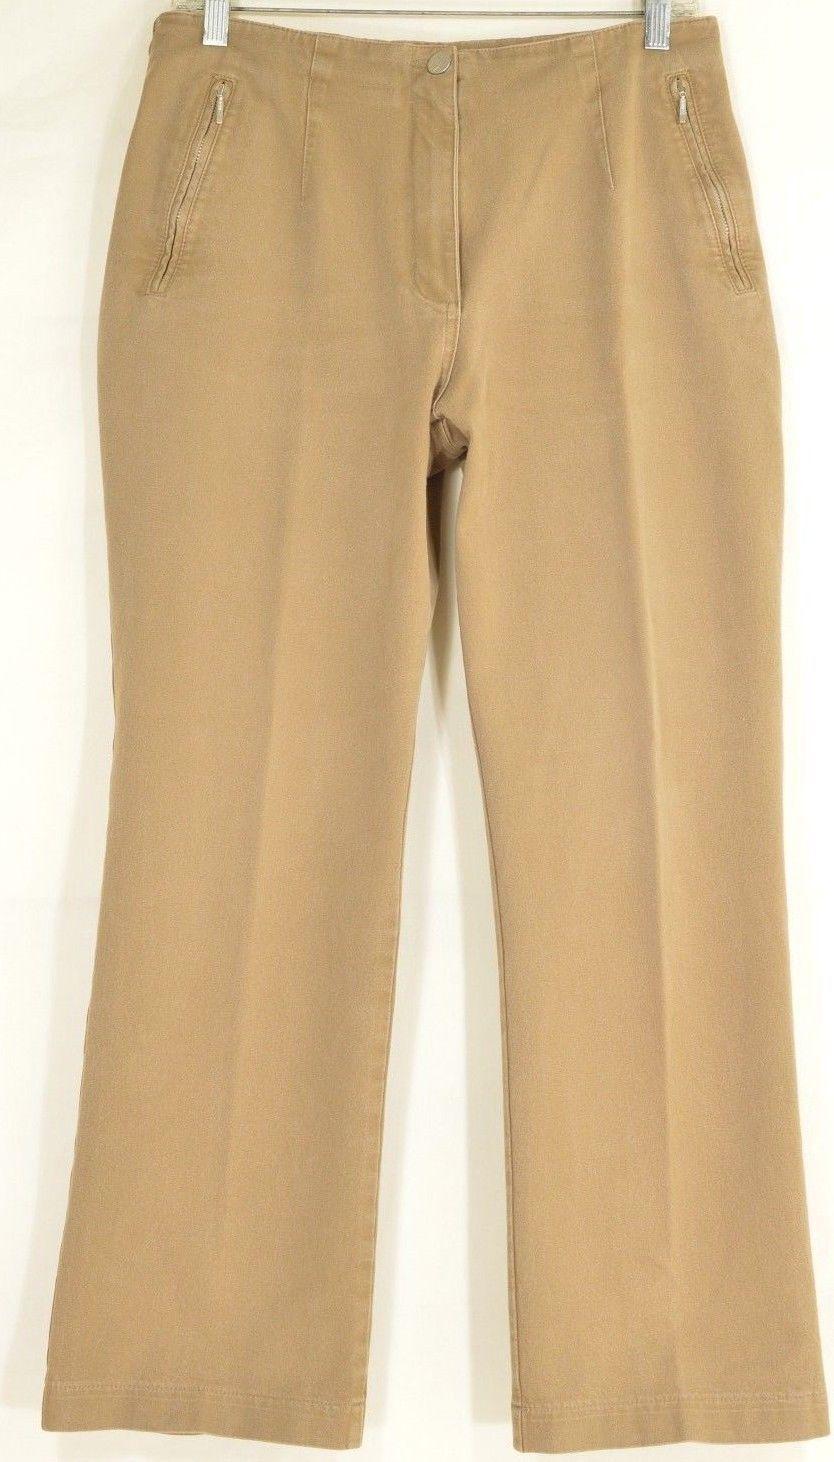 Vanilia pants US 10 E 42 Jacky Becky light brown tan zipper pockets chic career